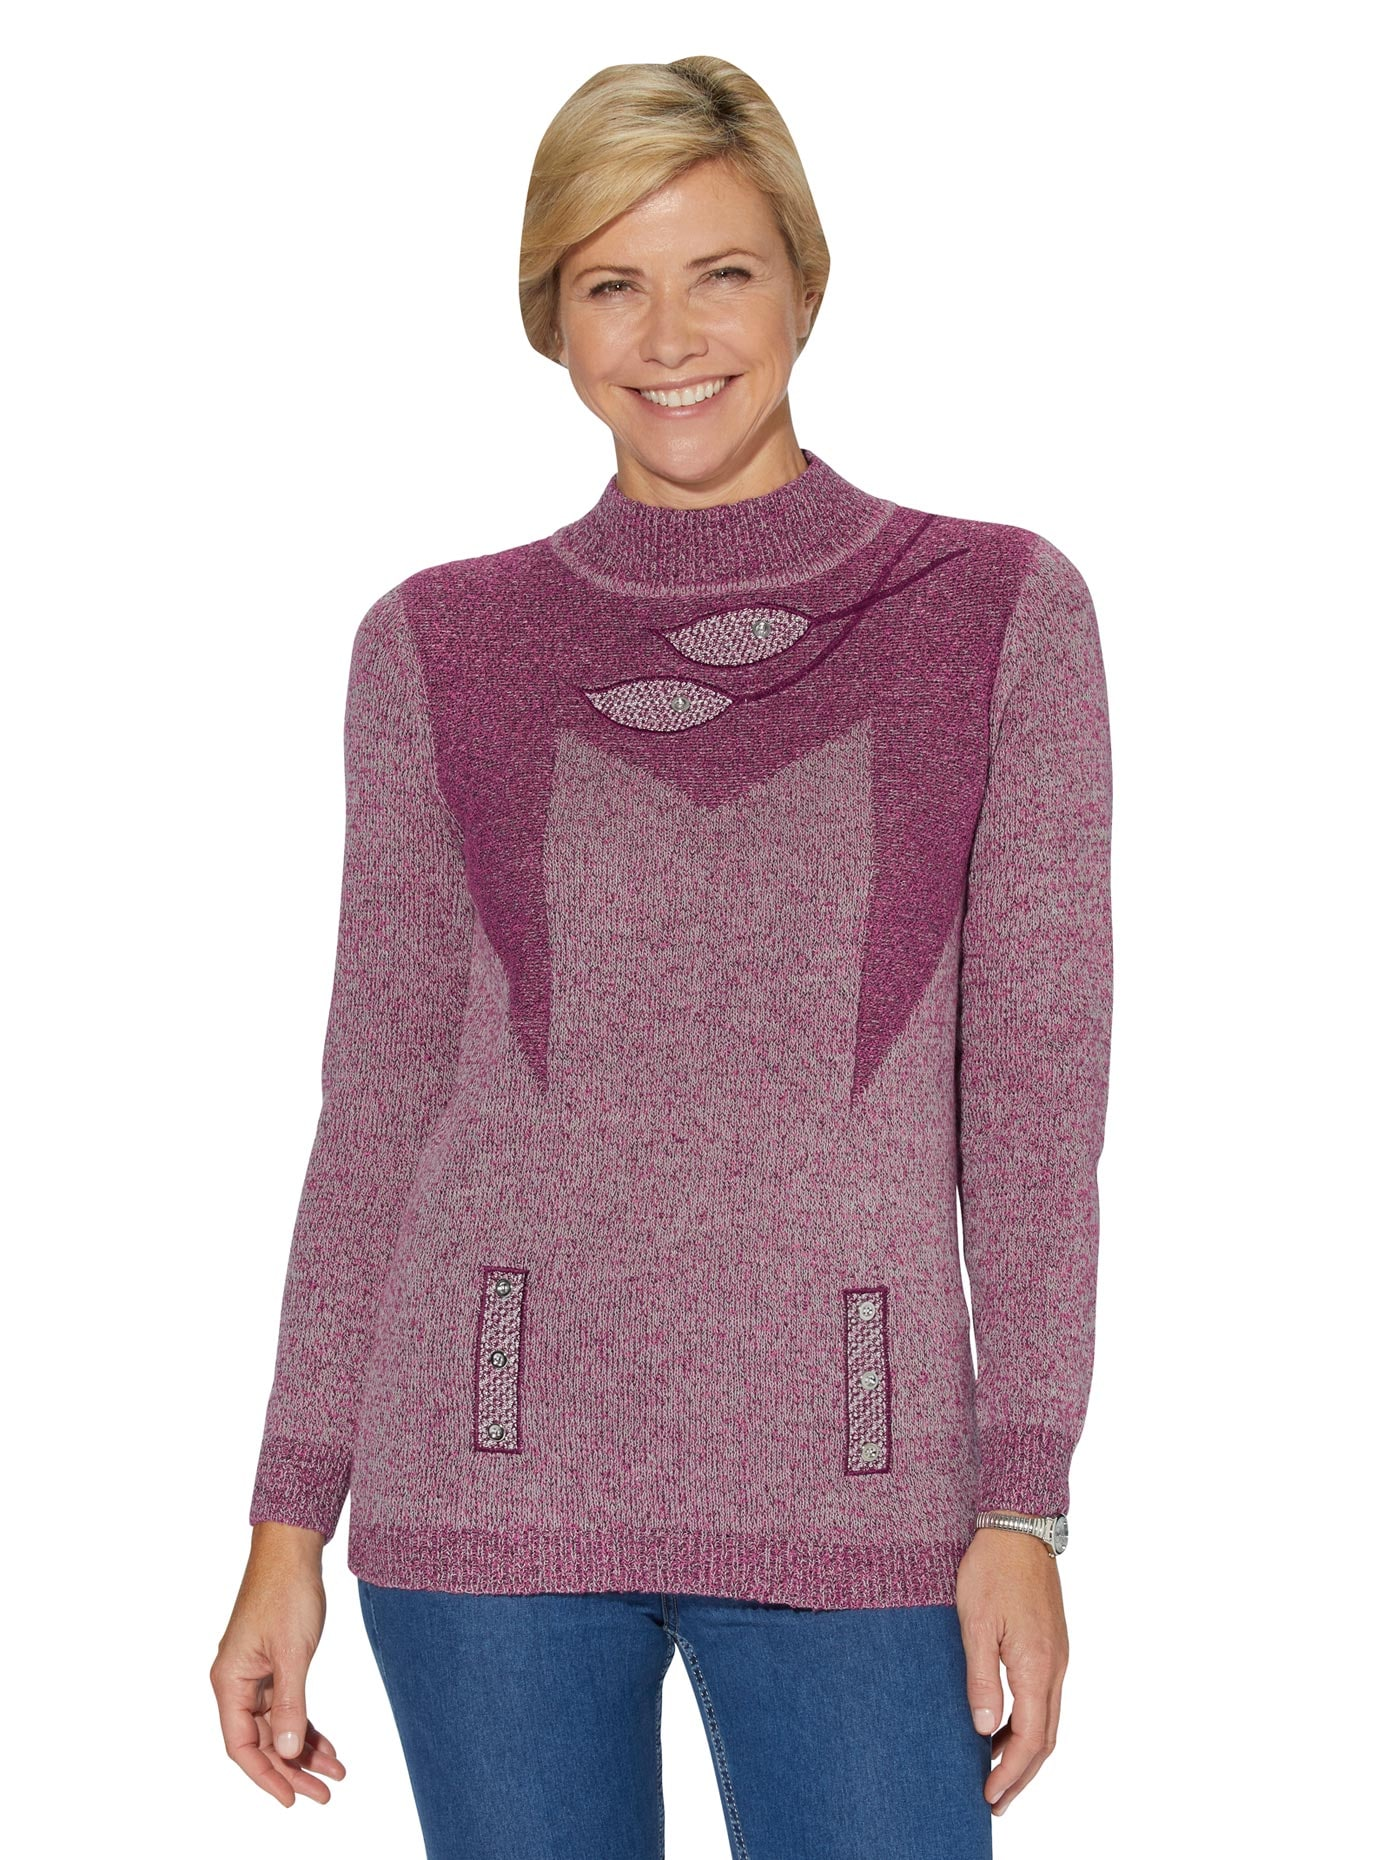 classic basics -  Strickpullover Pullover